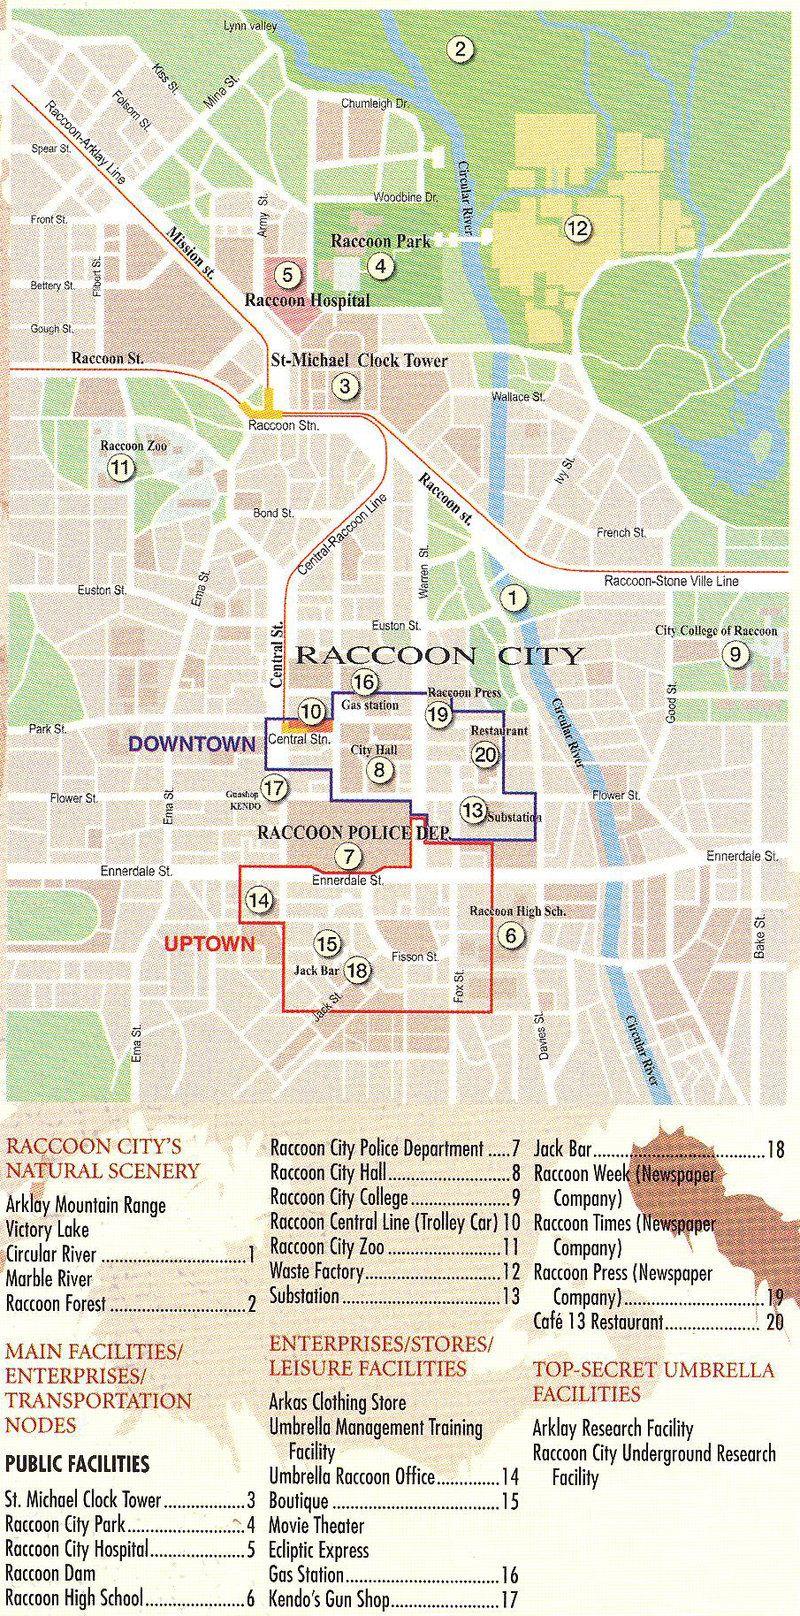 Raccoon City Map Raccoon City Map by Zaidtomo.deviantart.on @DeviantArt